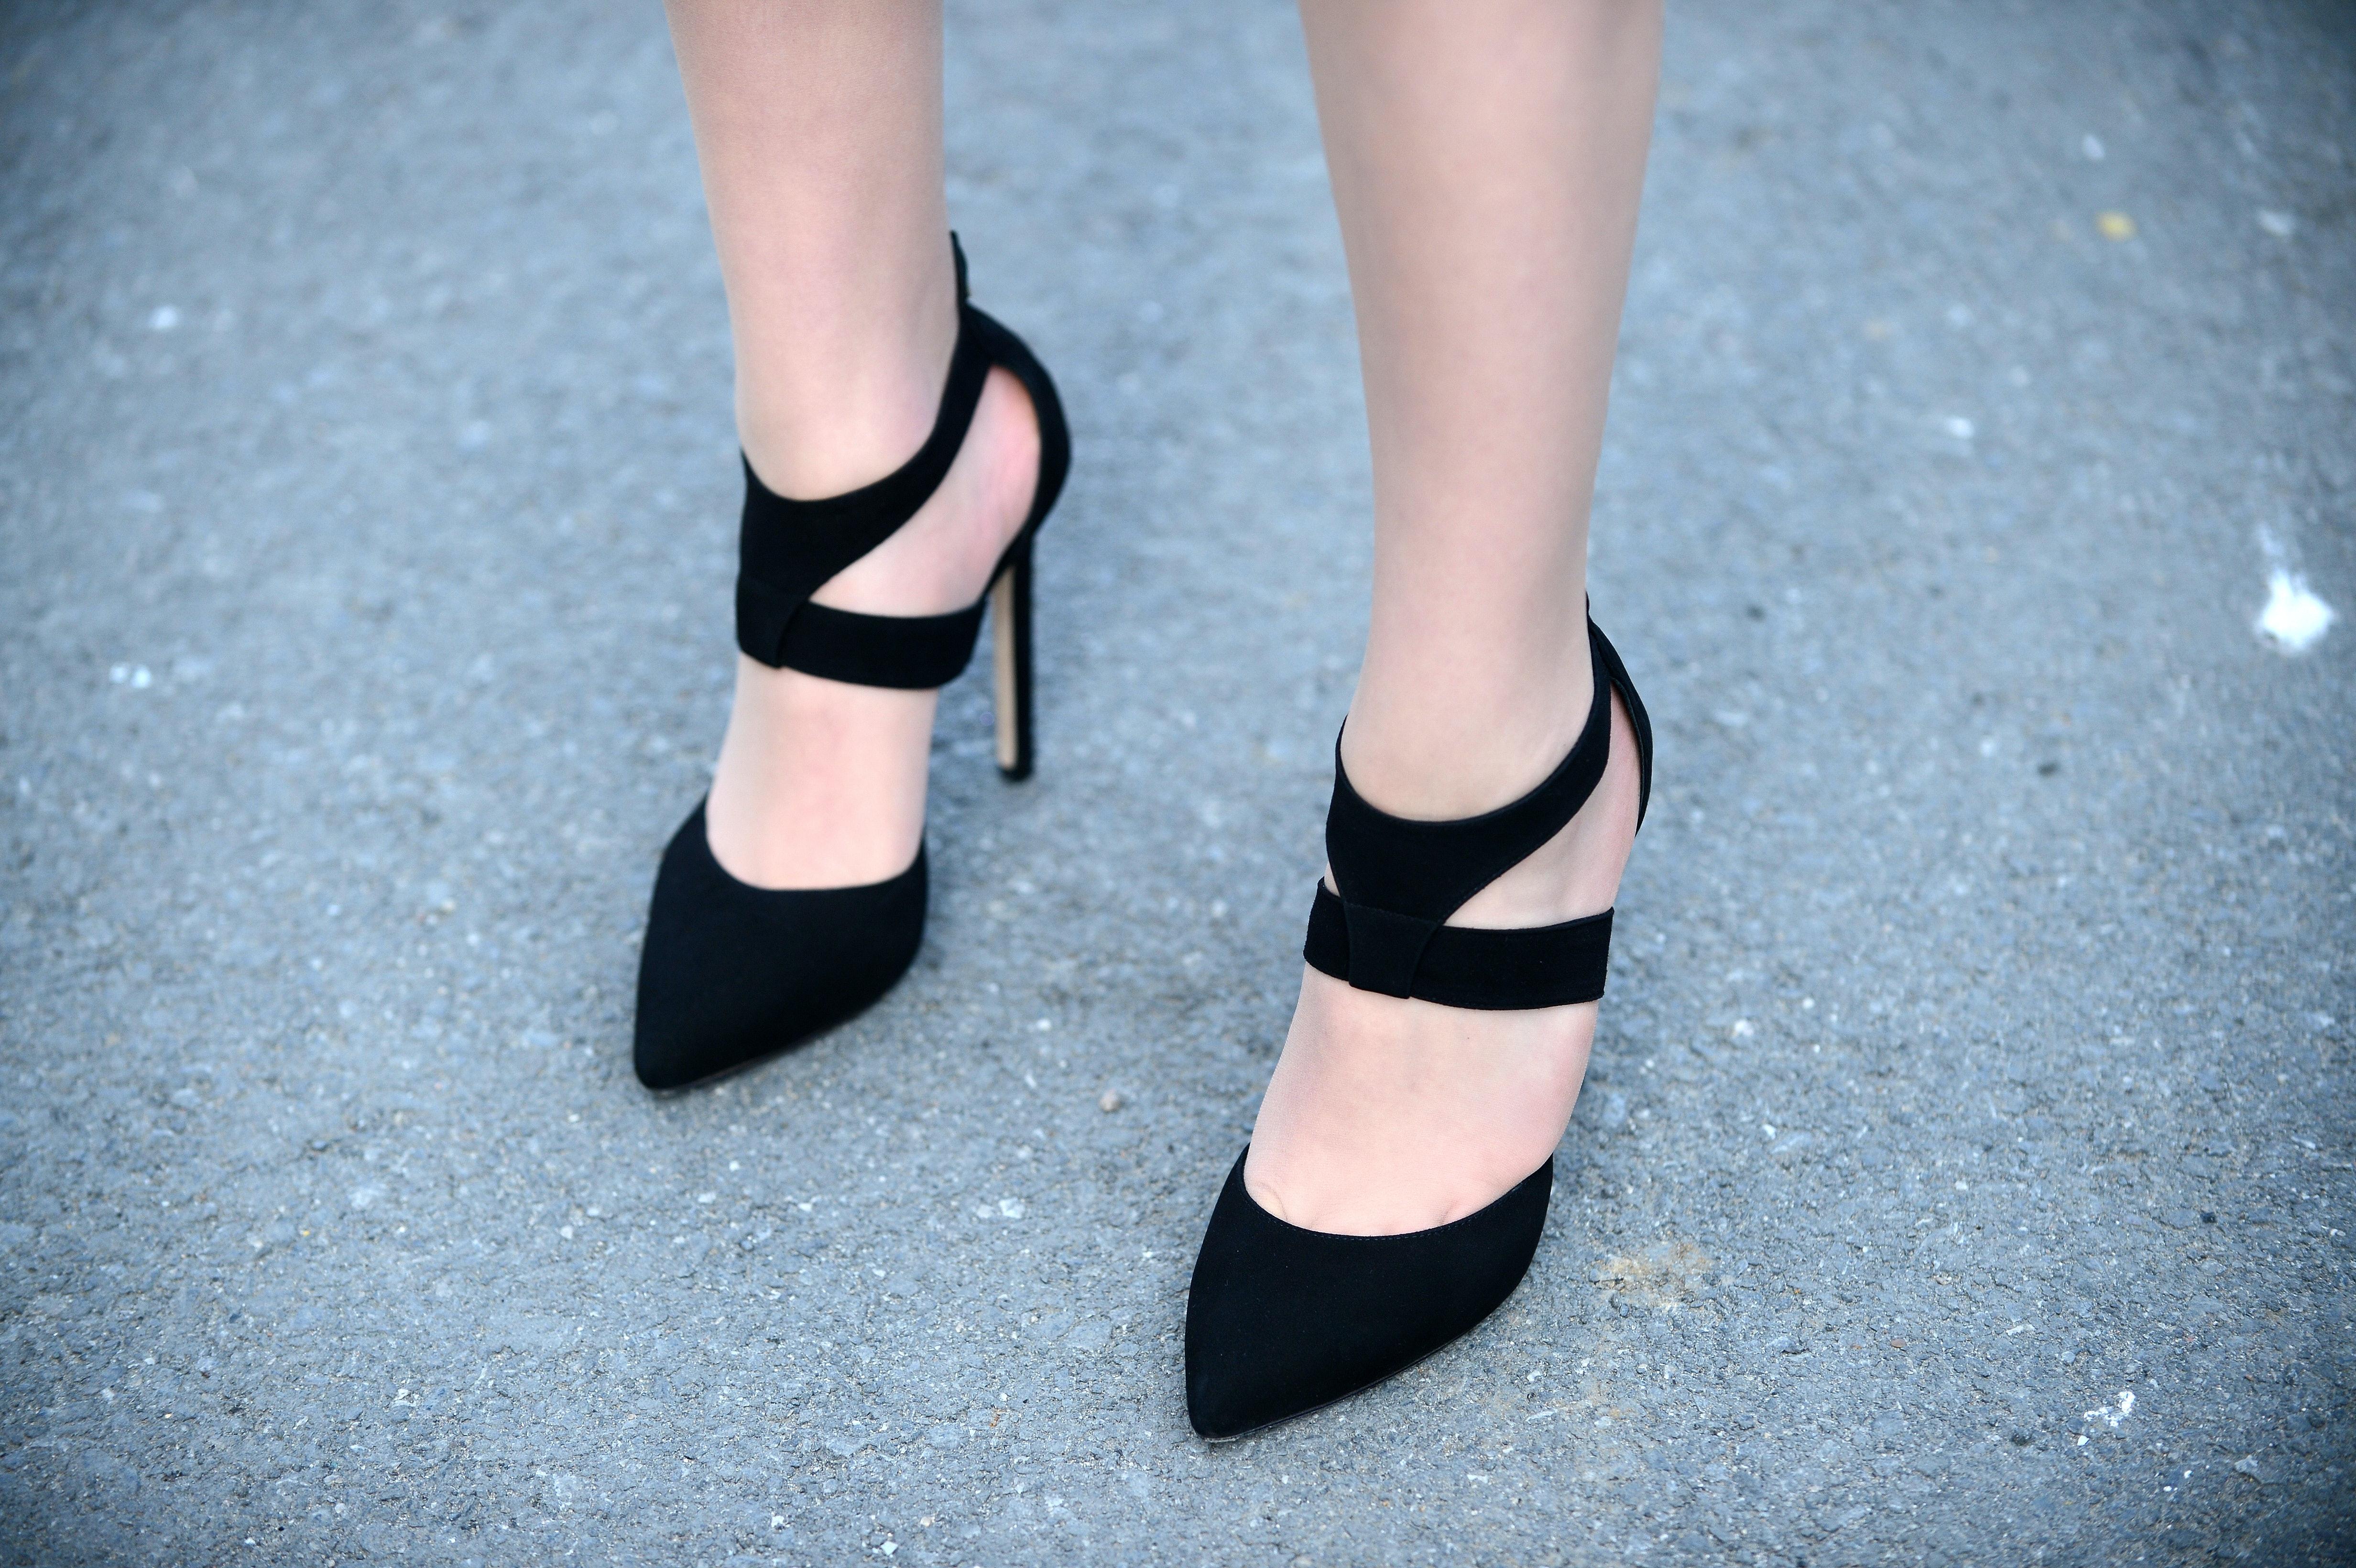 7 Hacks For Making Heels More Comfortable